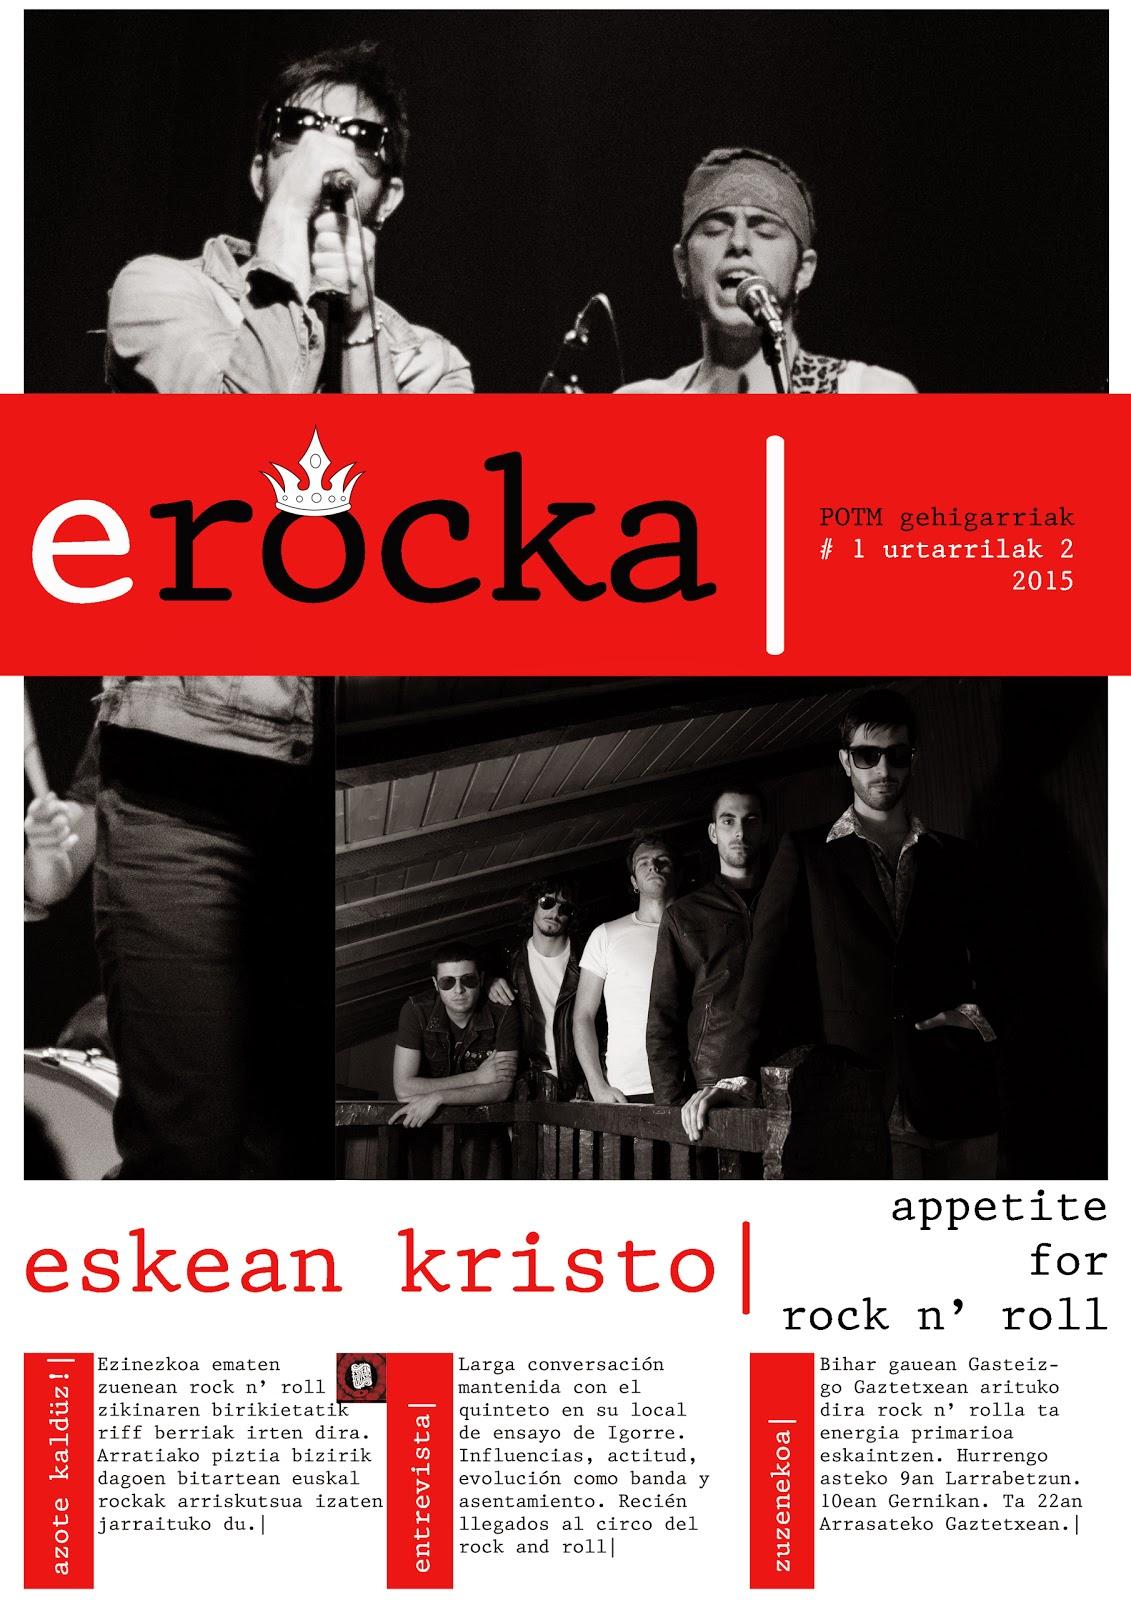 http://prideofthemonster.blogspot.com.es/2015/01/eskean-kristo-appetite-for-rock-n-roll.html